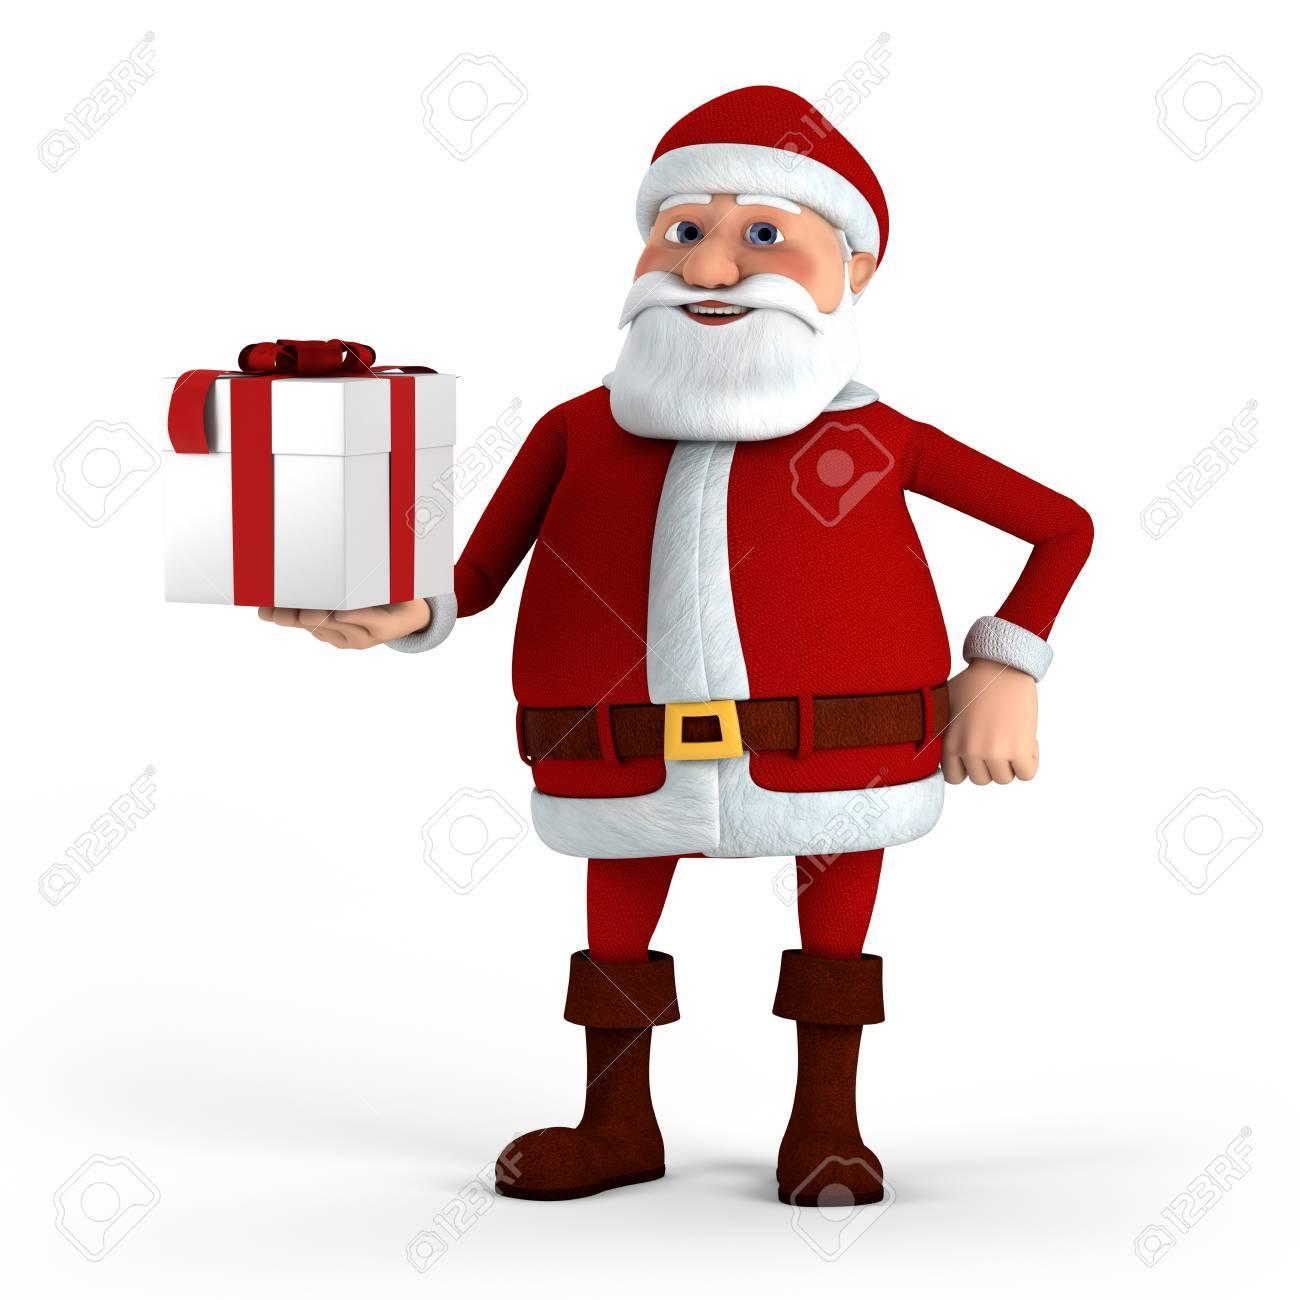 Cartoon Santa Claus offering present - high quality 3d illustration Stock Photo - 10255564